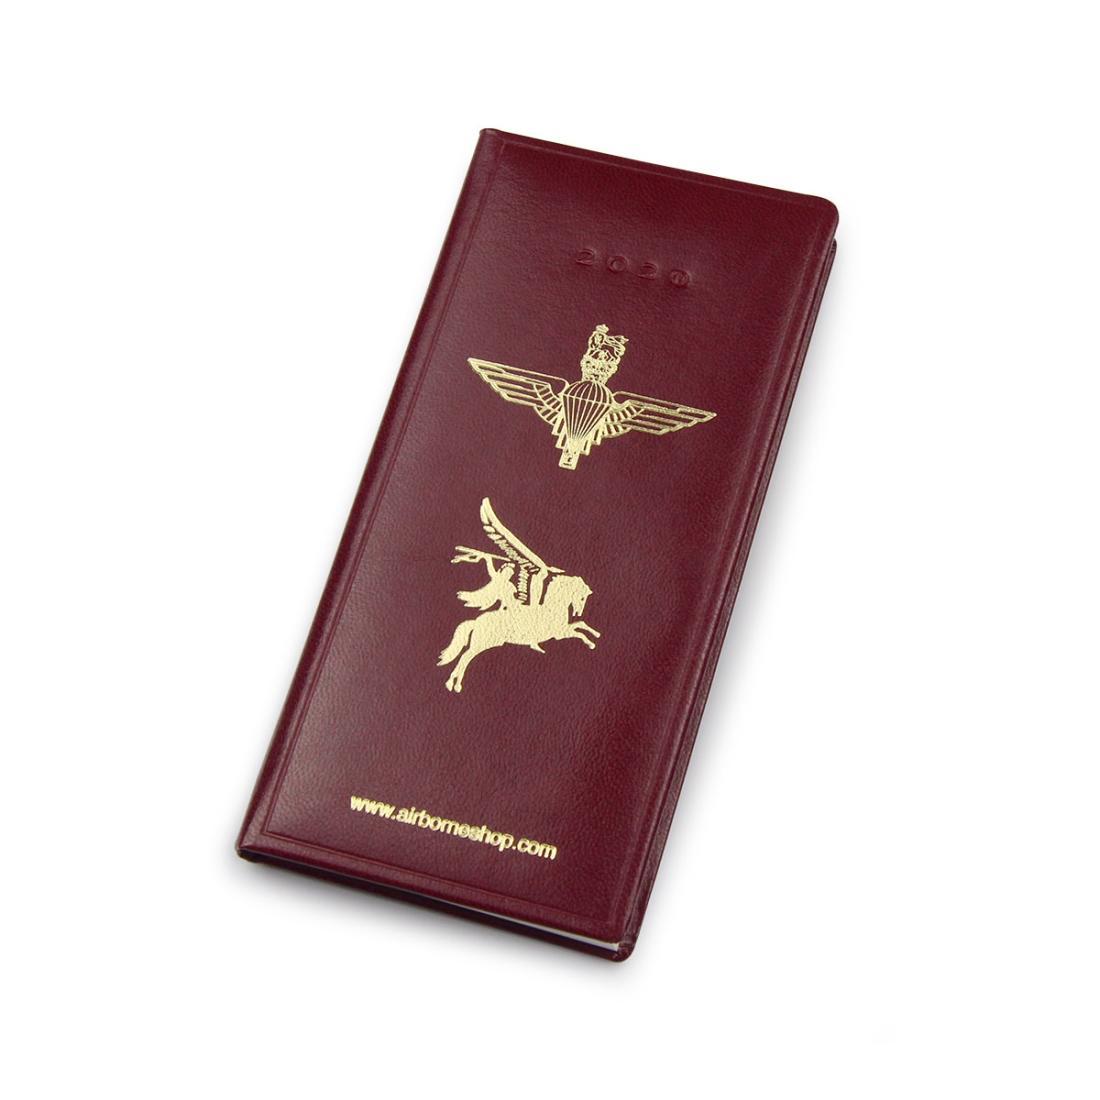 2020 Para & Pegasus Pocket Diary